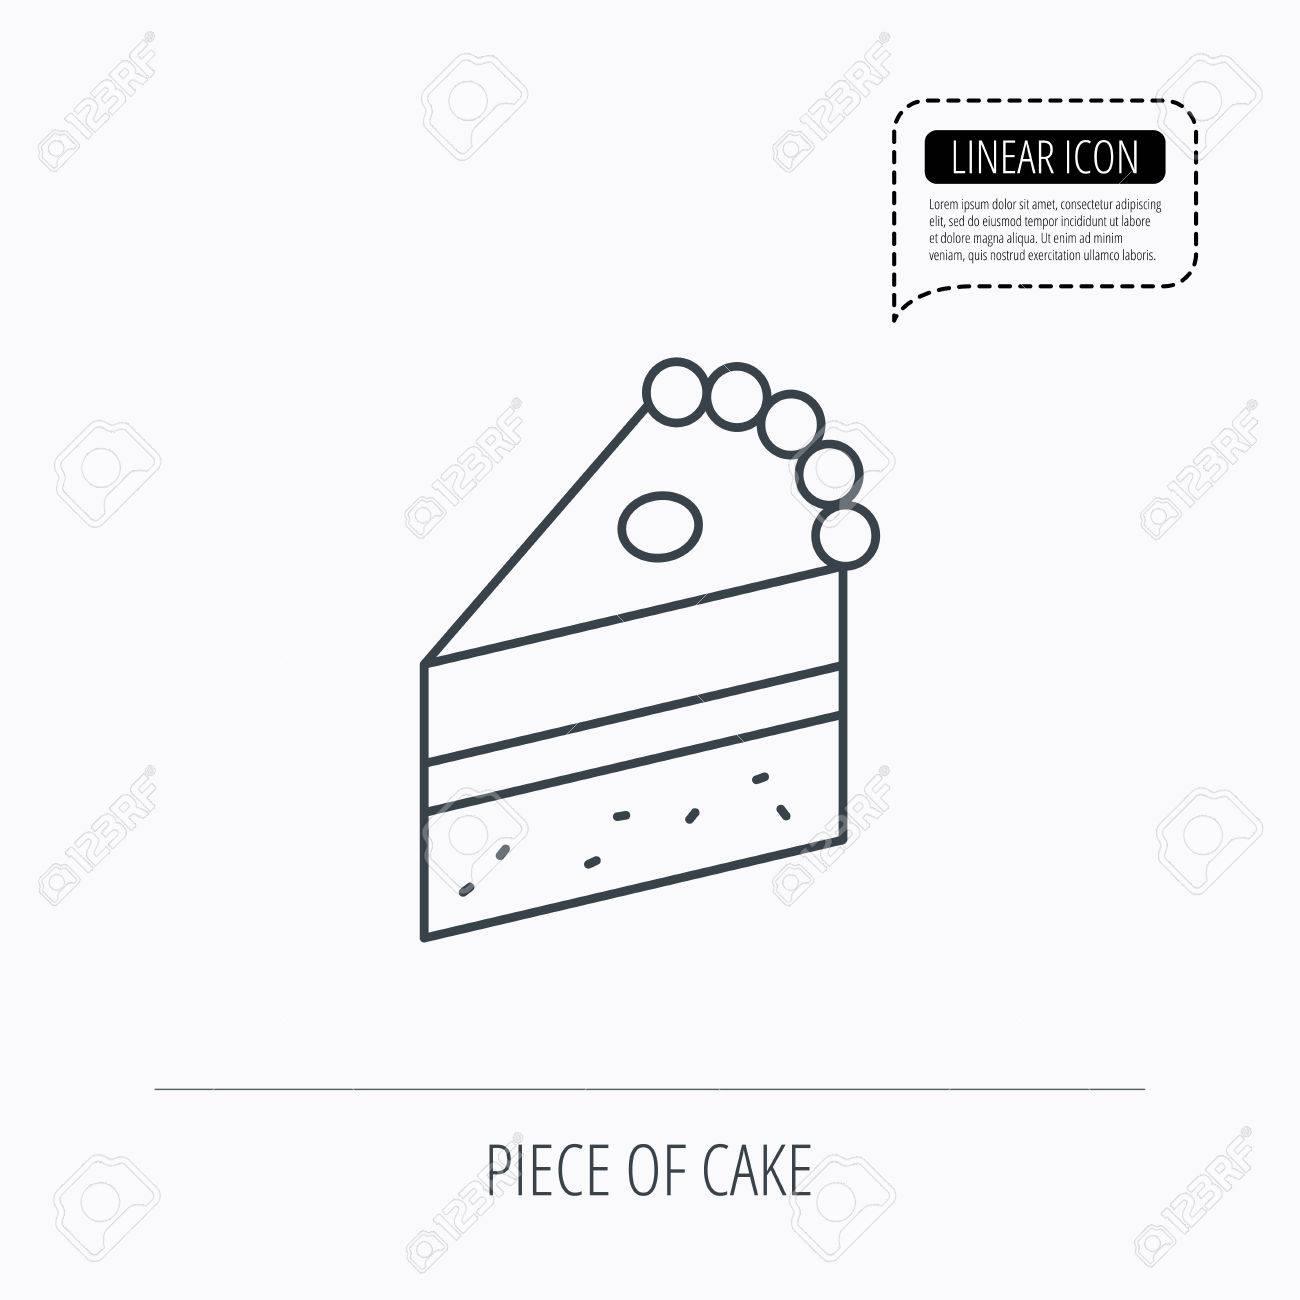 Dotted Line Drawing Cake Wiring Diagrams Seriesresonantpowersupply Powersupplycircuit Circuit Diagram Piece Of Icon Sweet Dessert Sign Pastry Food Symbol Linear Rh 123rf Com